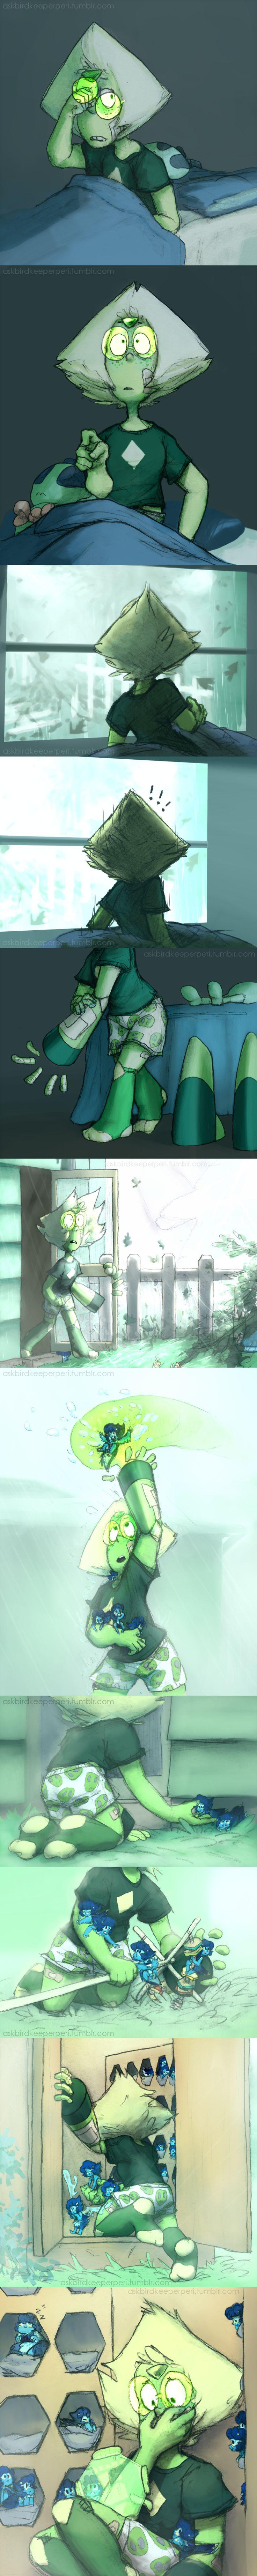 Steven universe,фэндомы,Peridot,SU Персонажи,Lapis Lazuli,SU comics